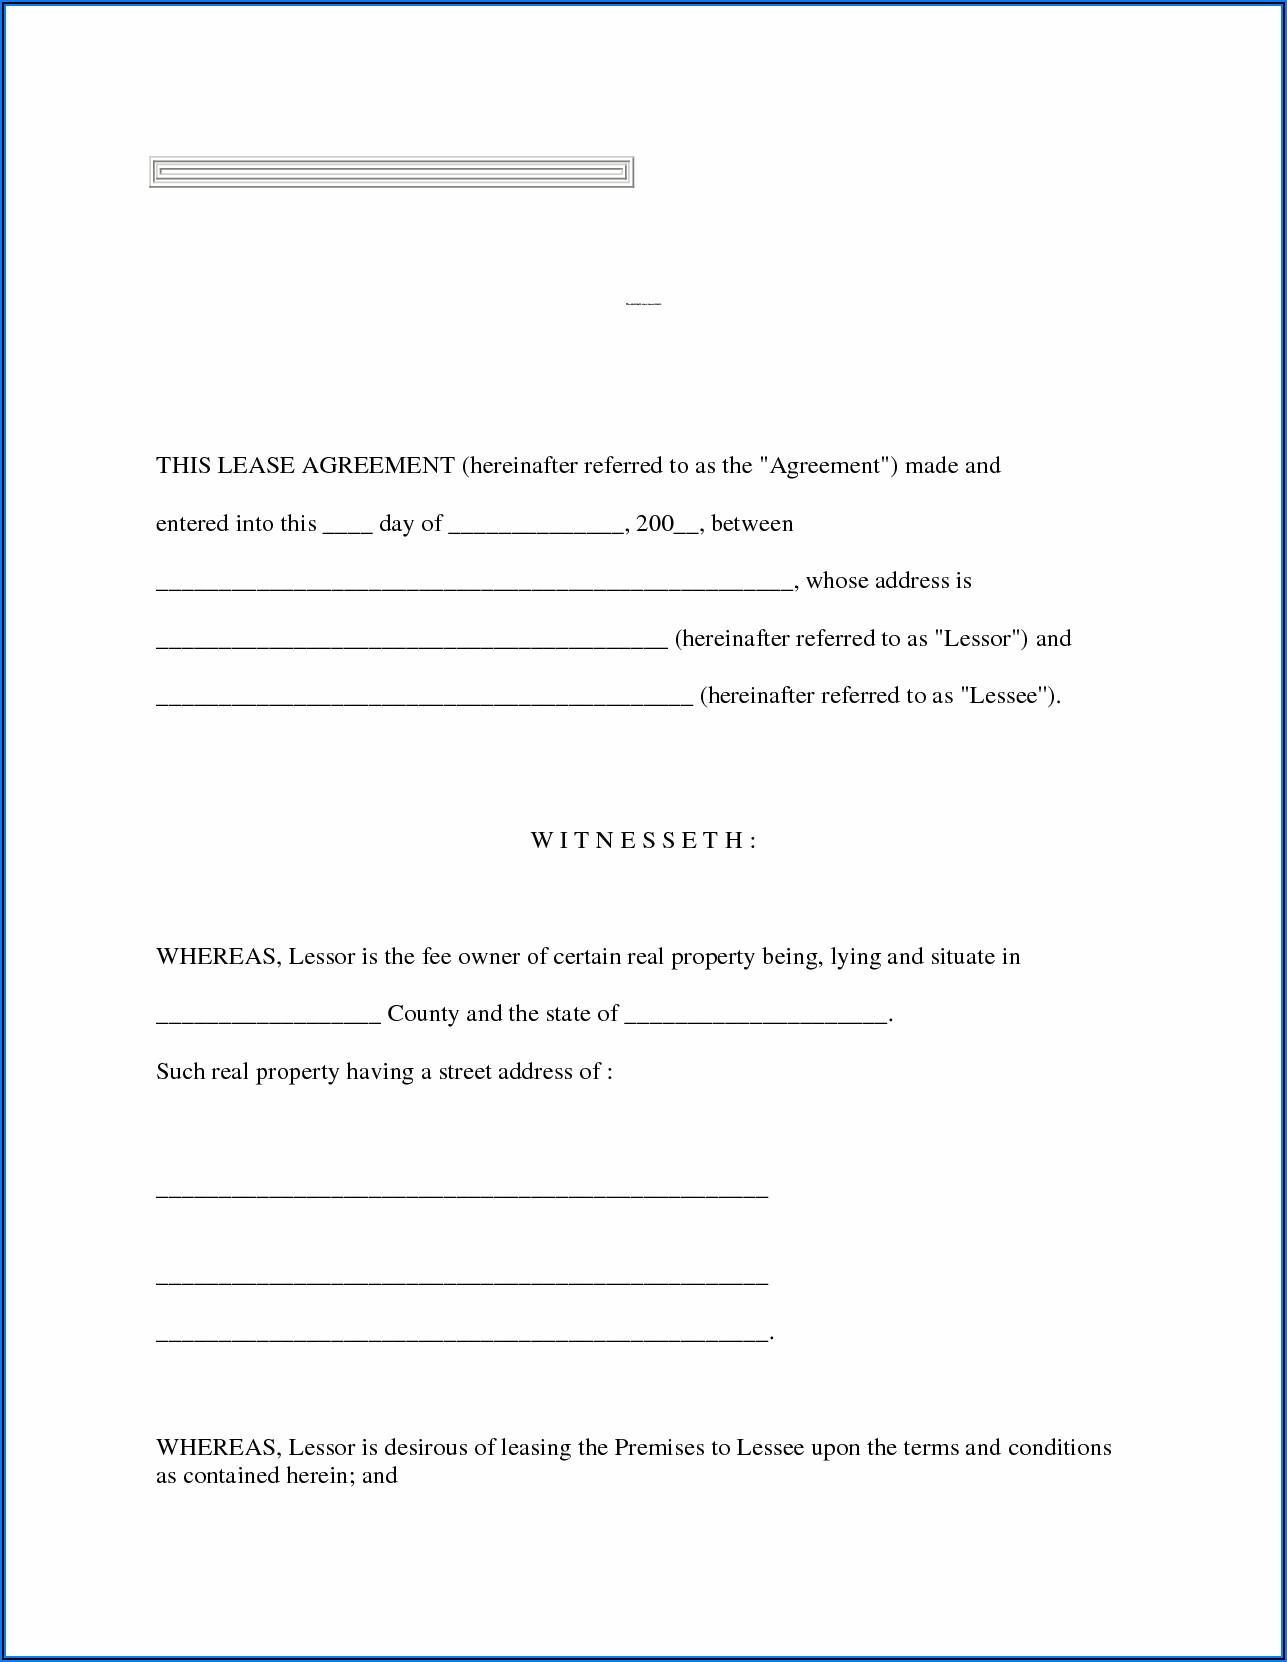 Passport Renewal Form Canada Printable